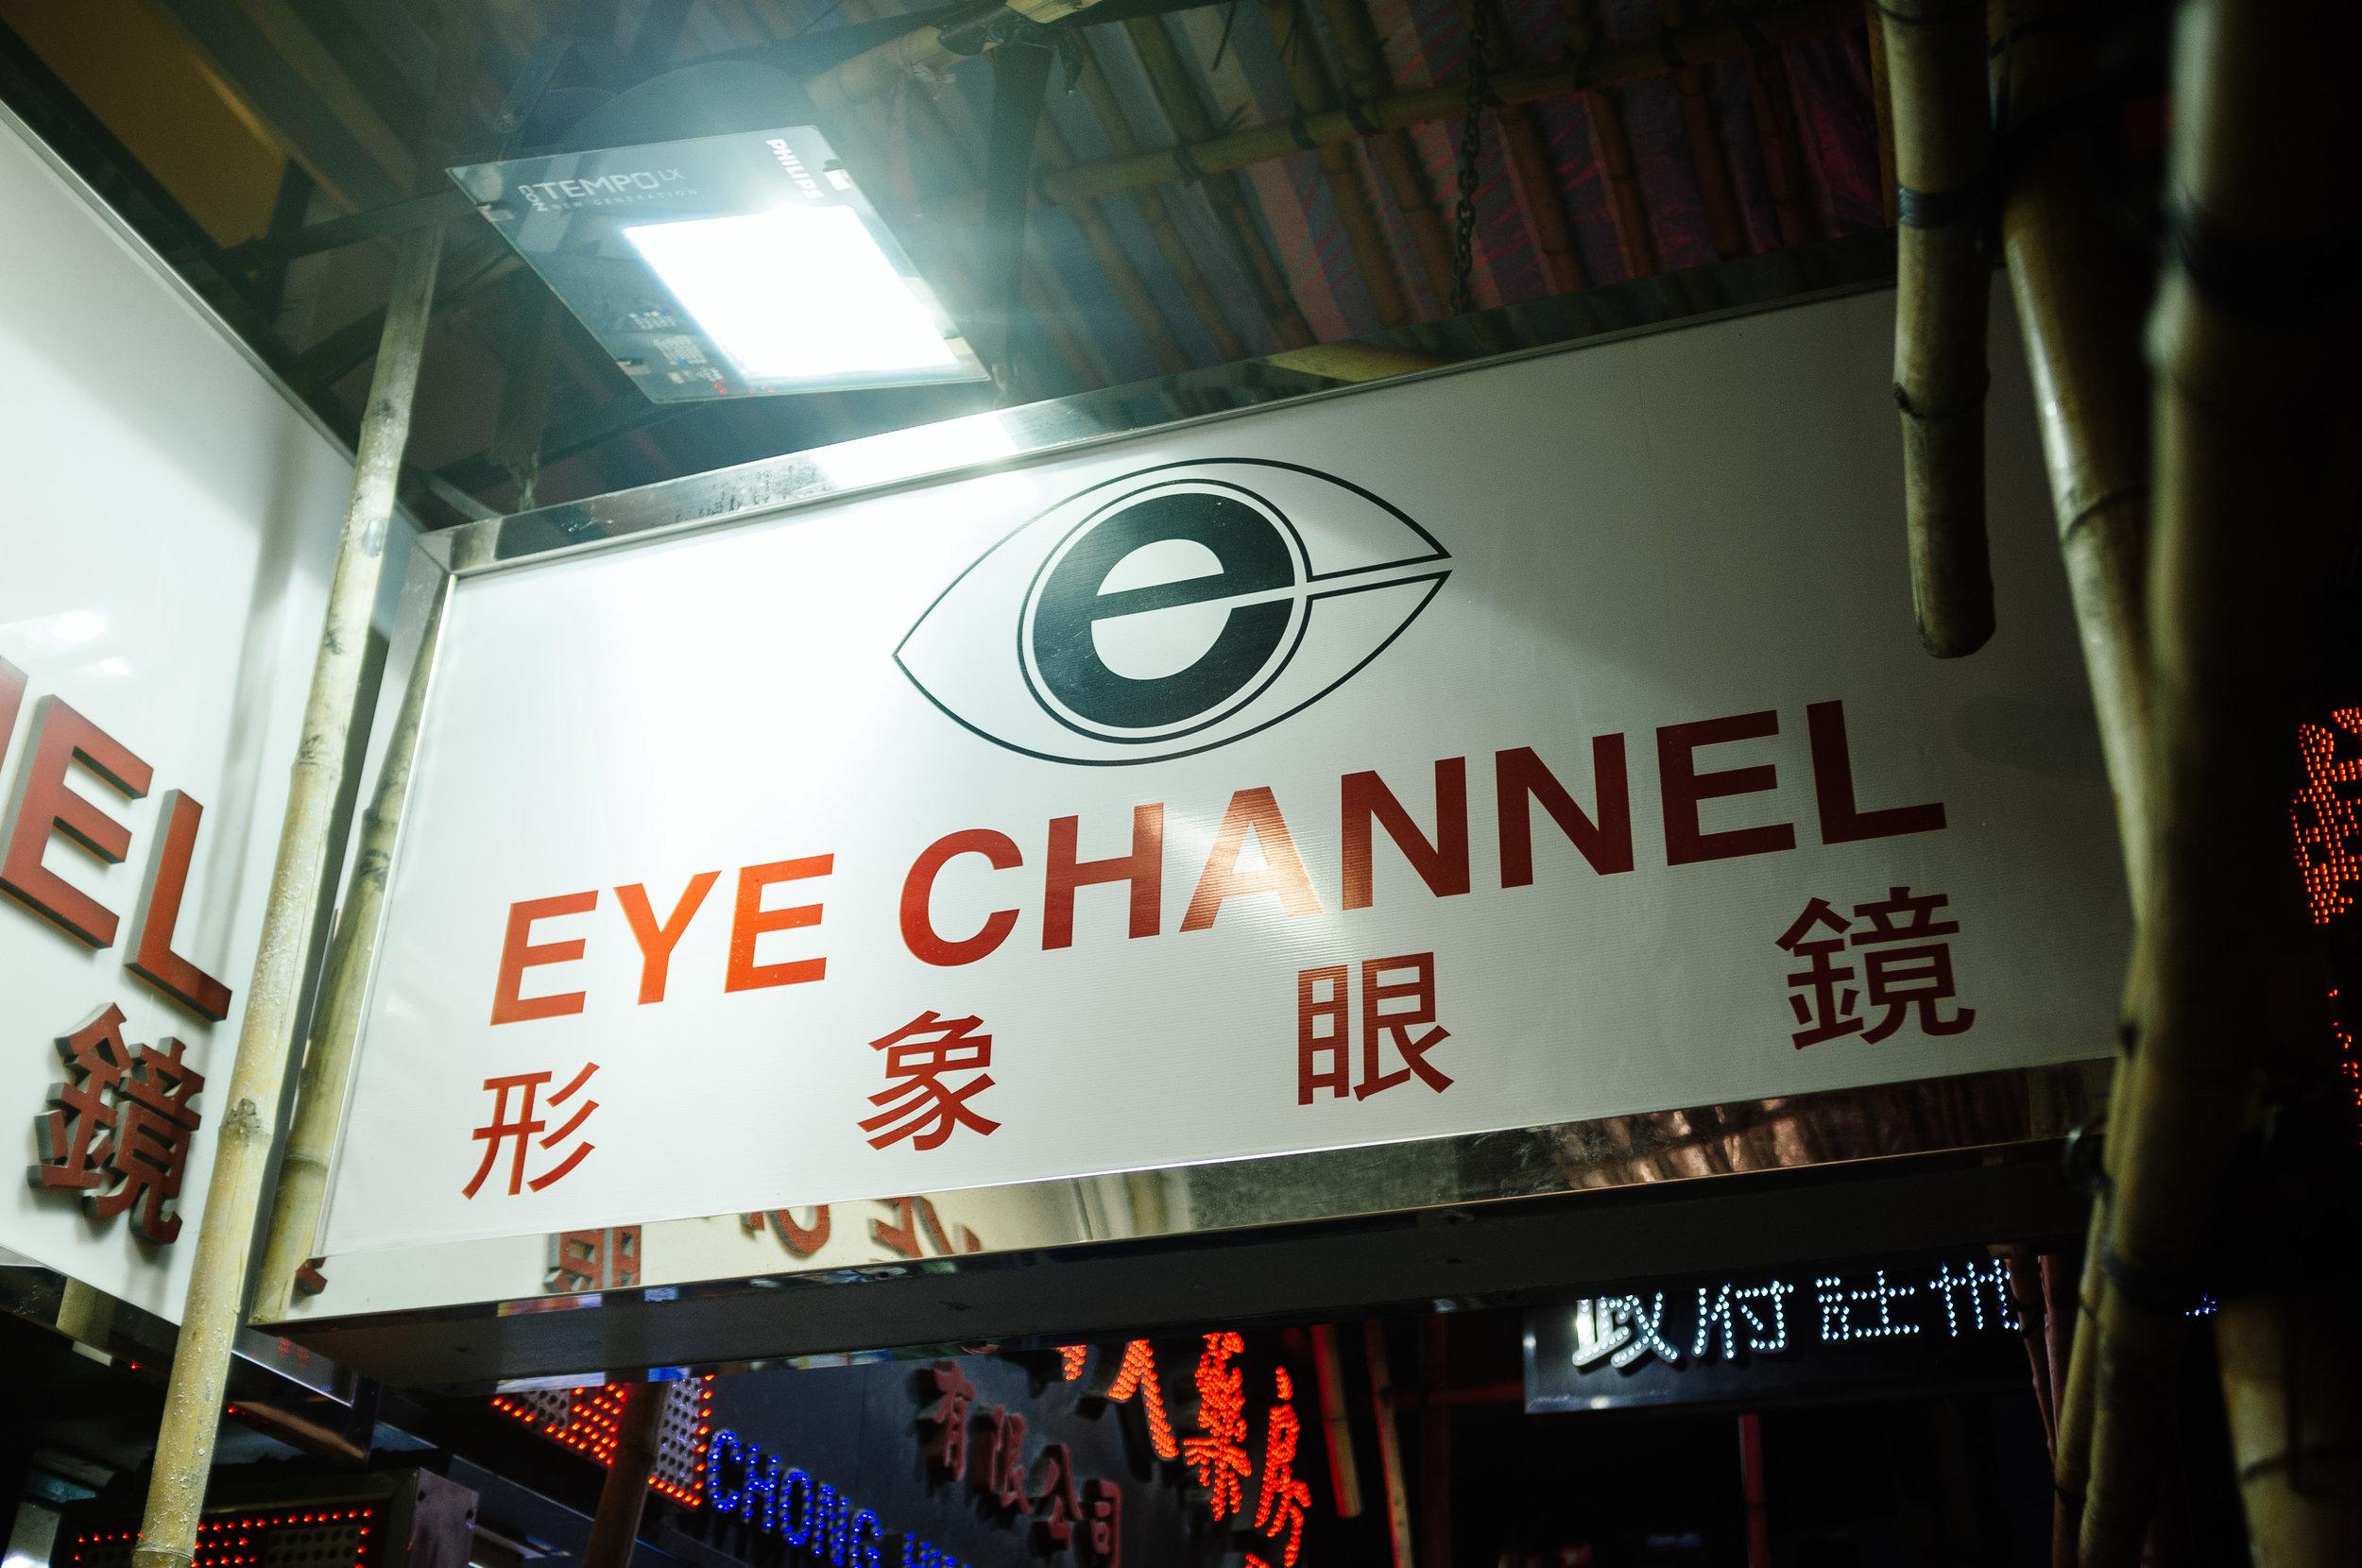 Mong Kok Eye Channel.jpg